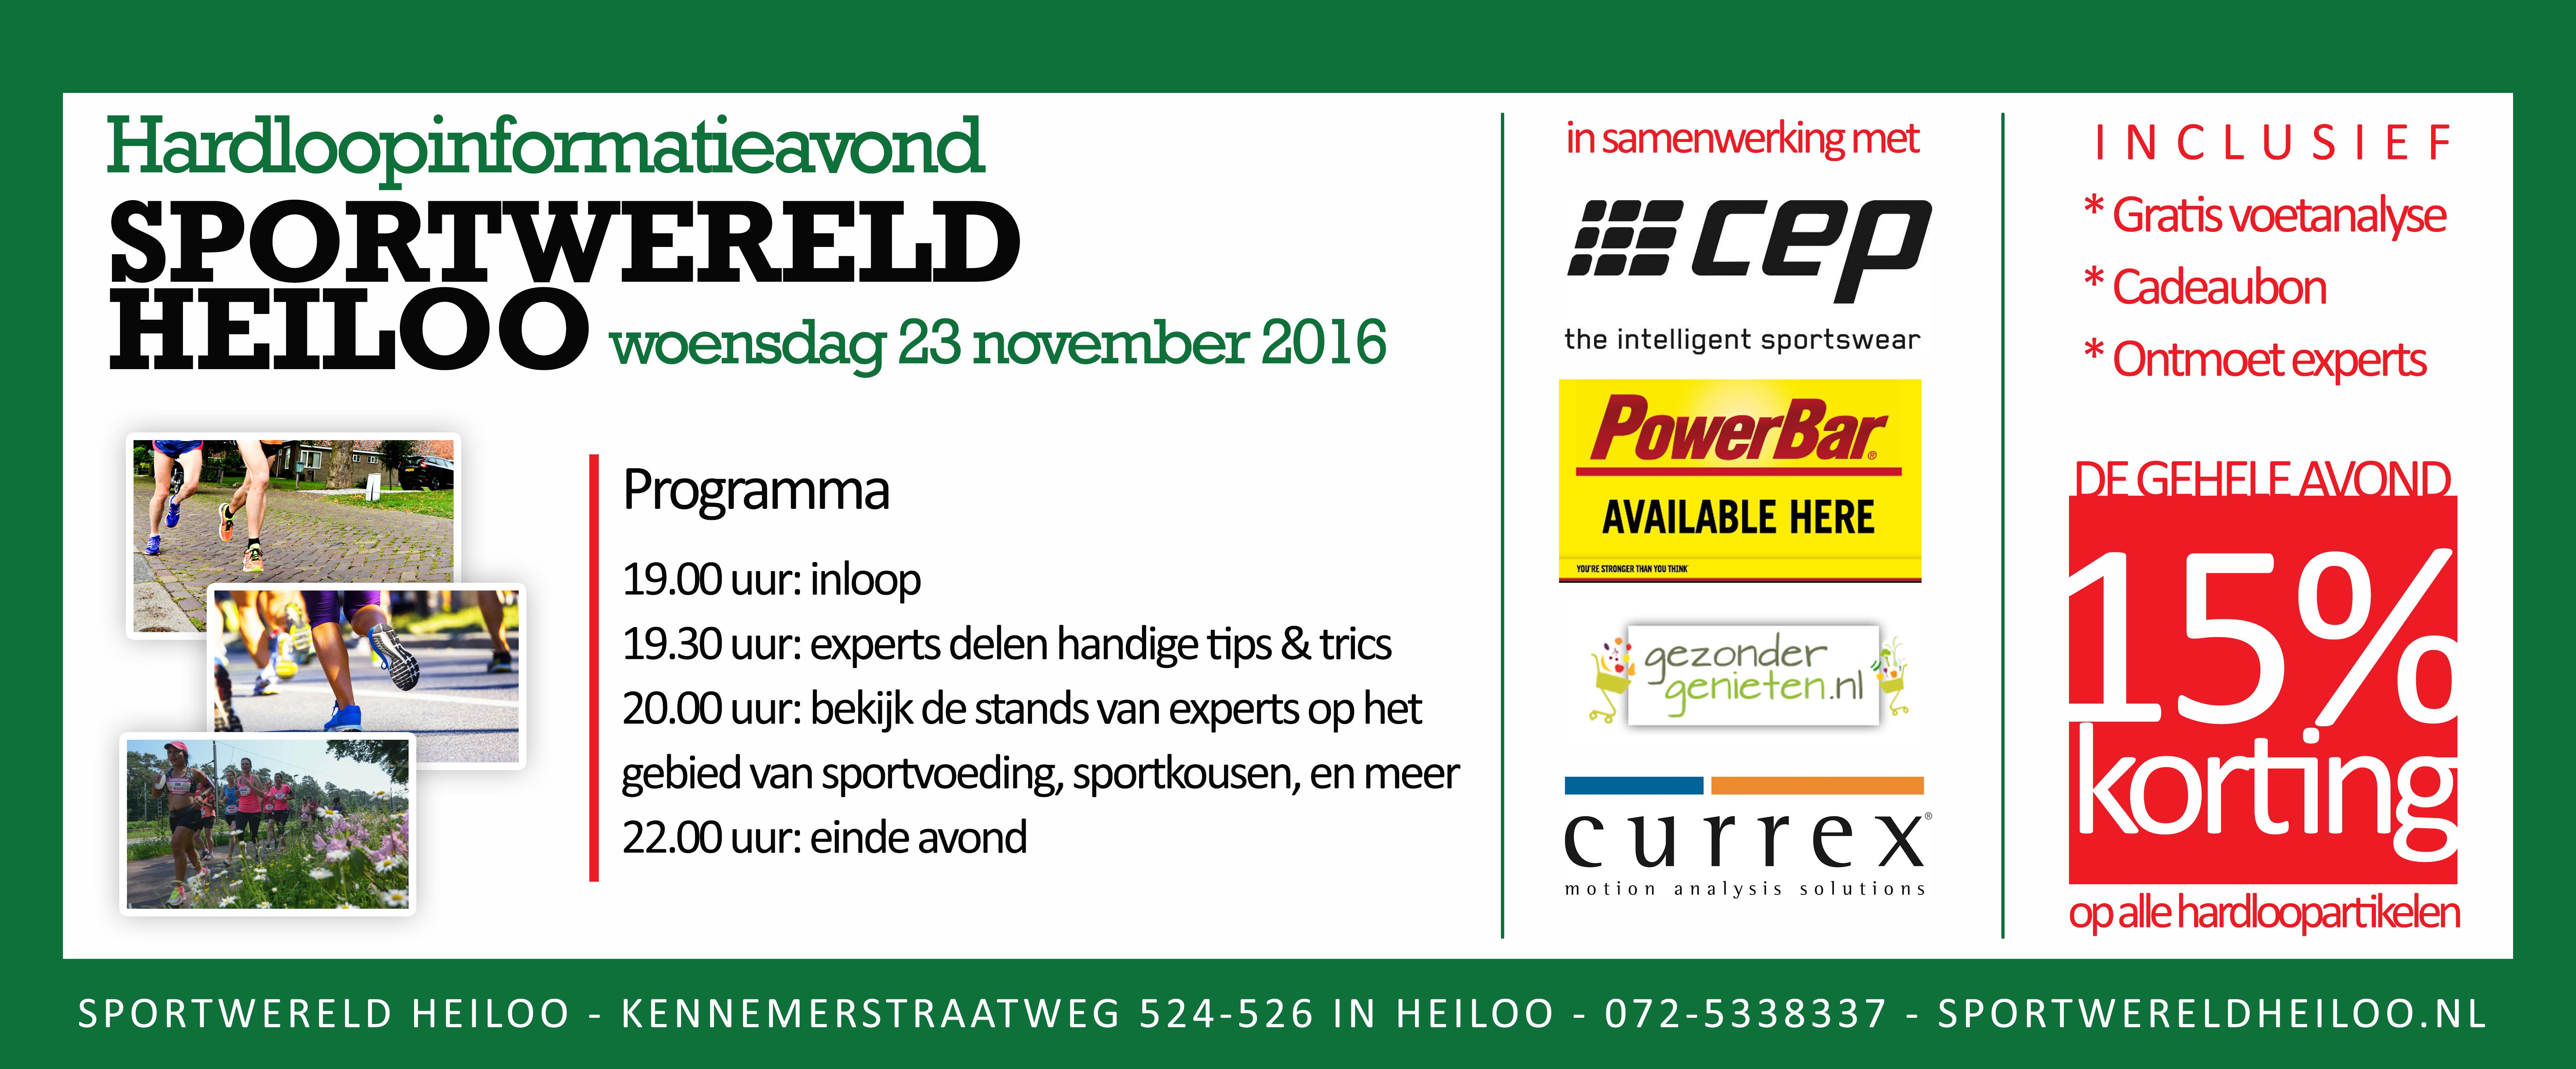 Gratis informatieavond running op 23 november 2016